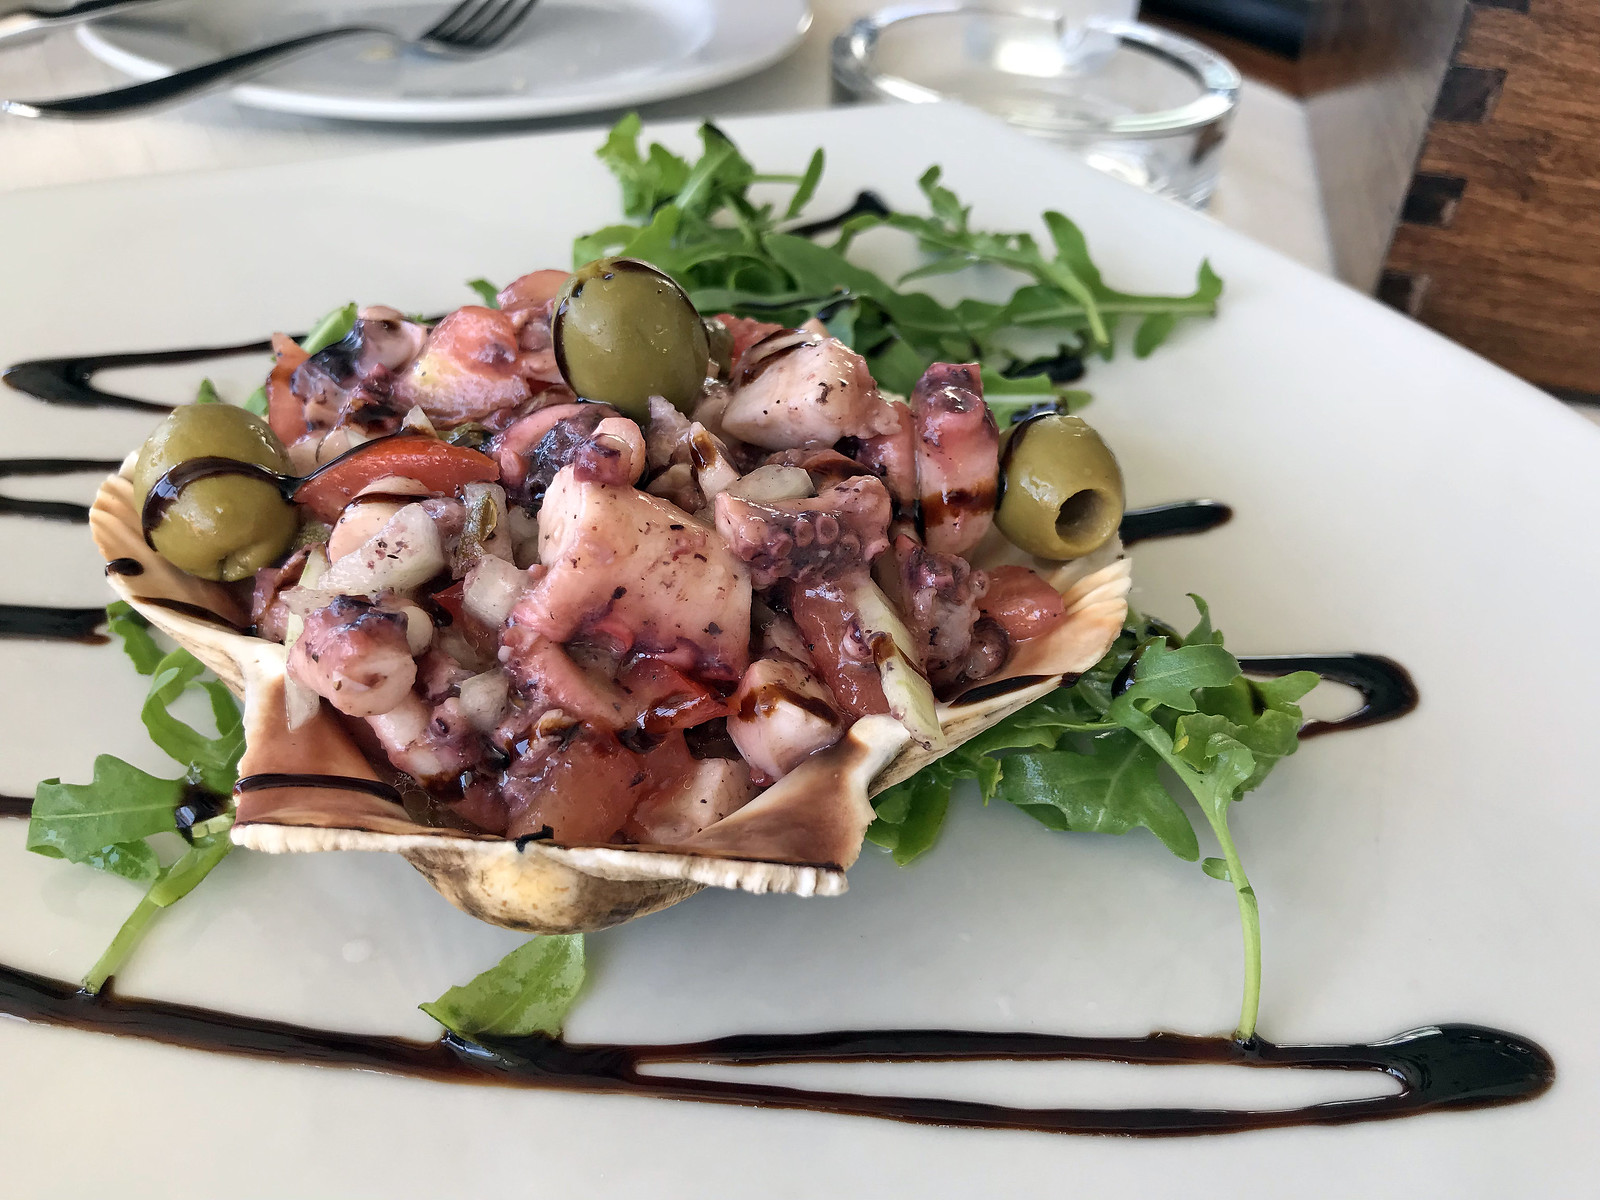 Octopus salad at Lungomare Restaurant